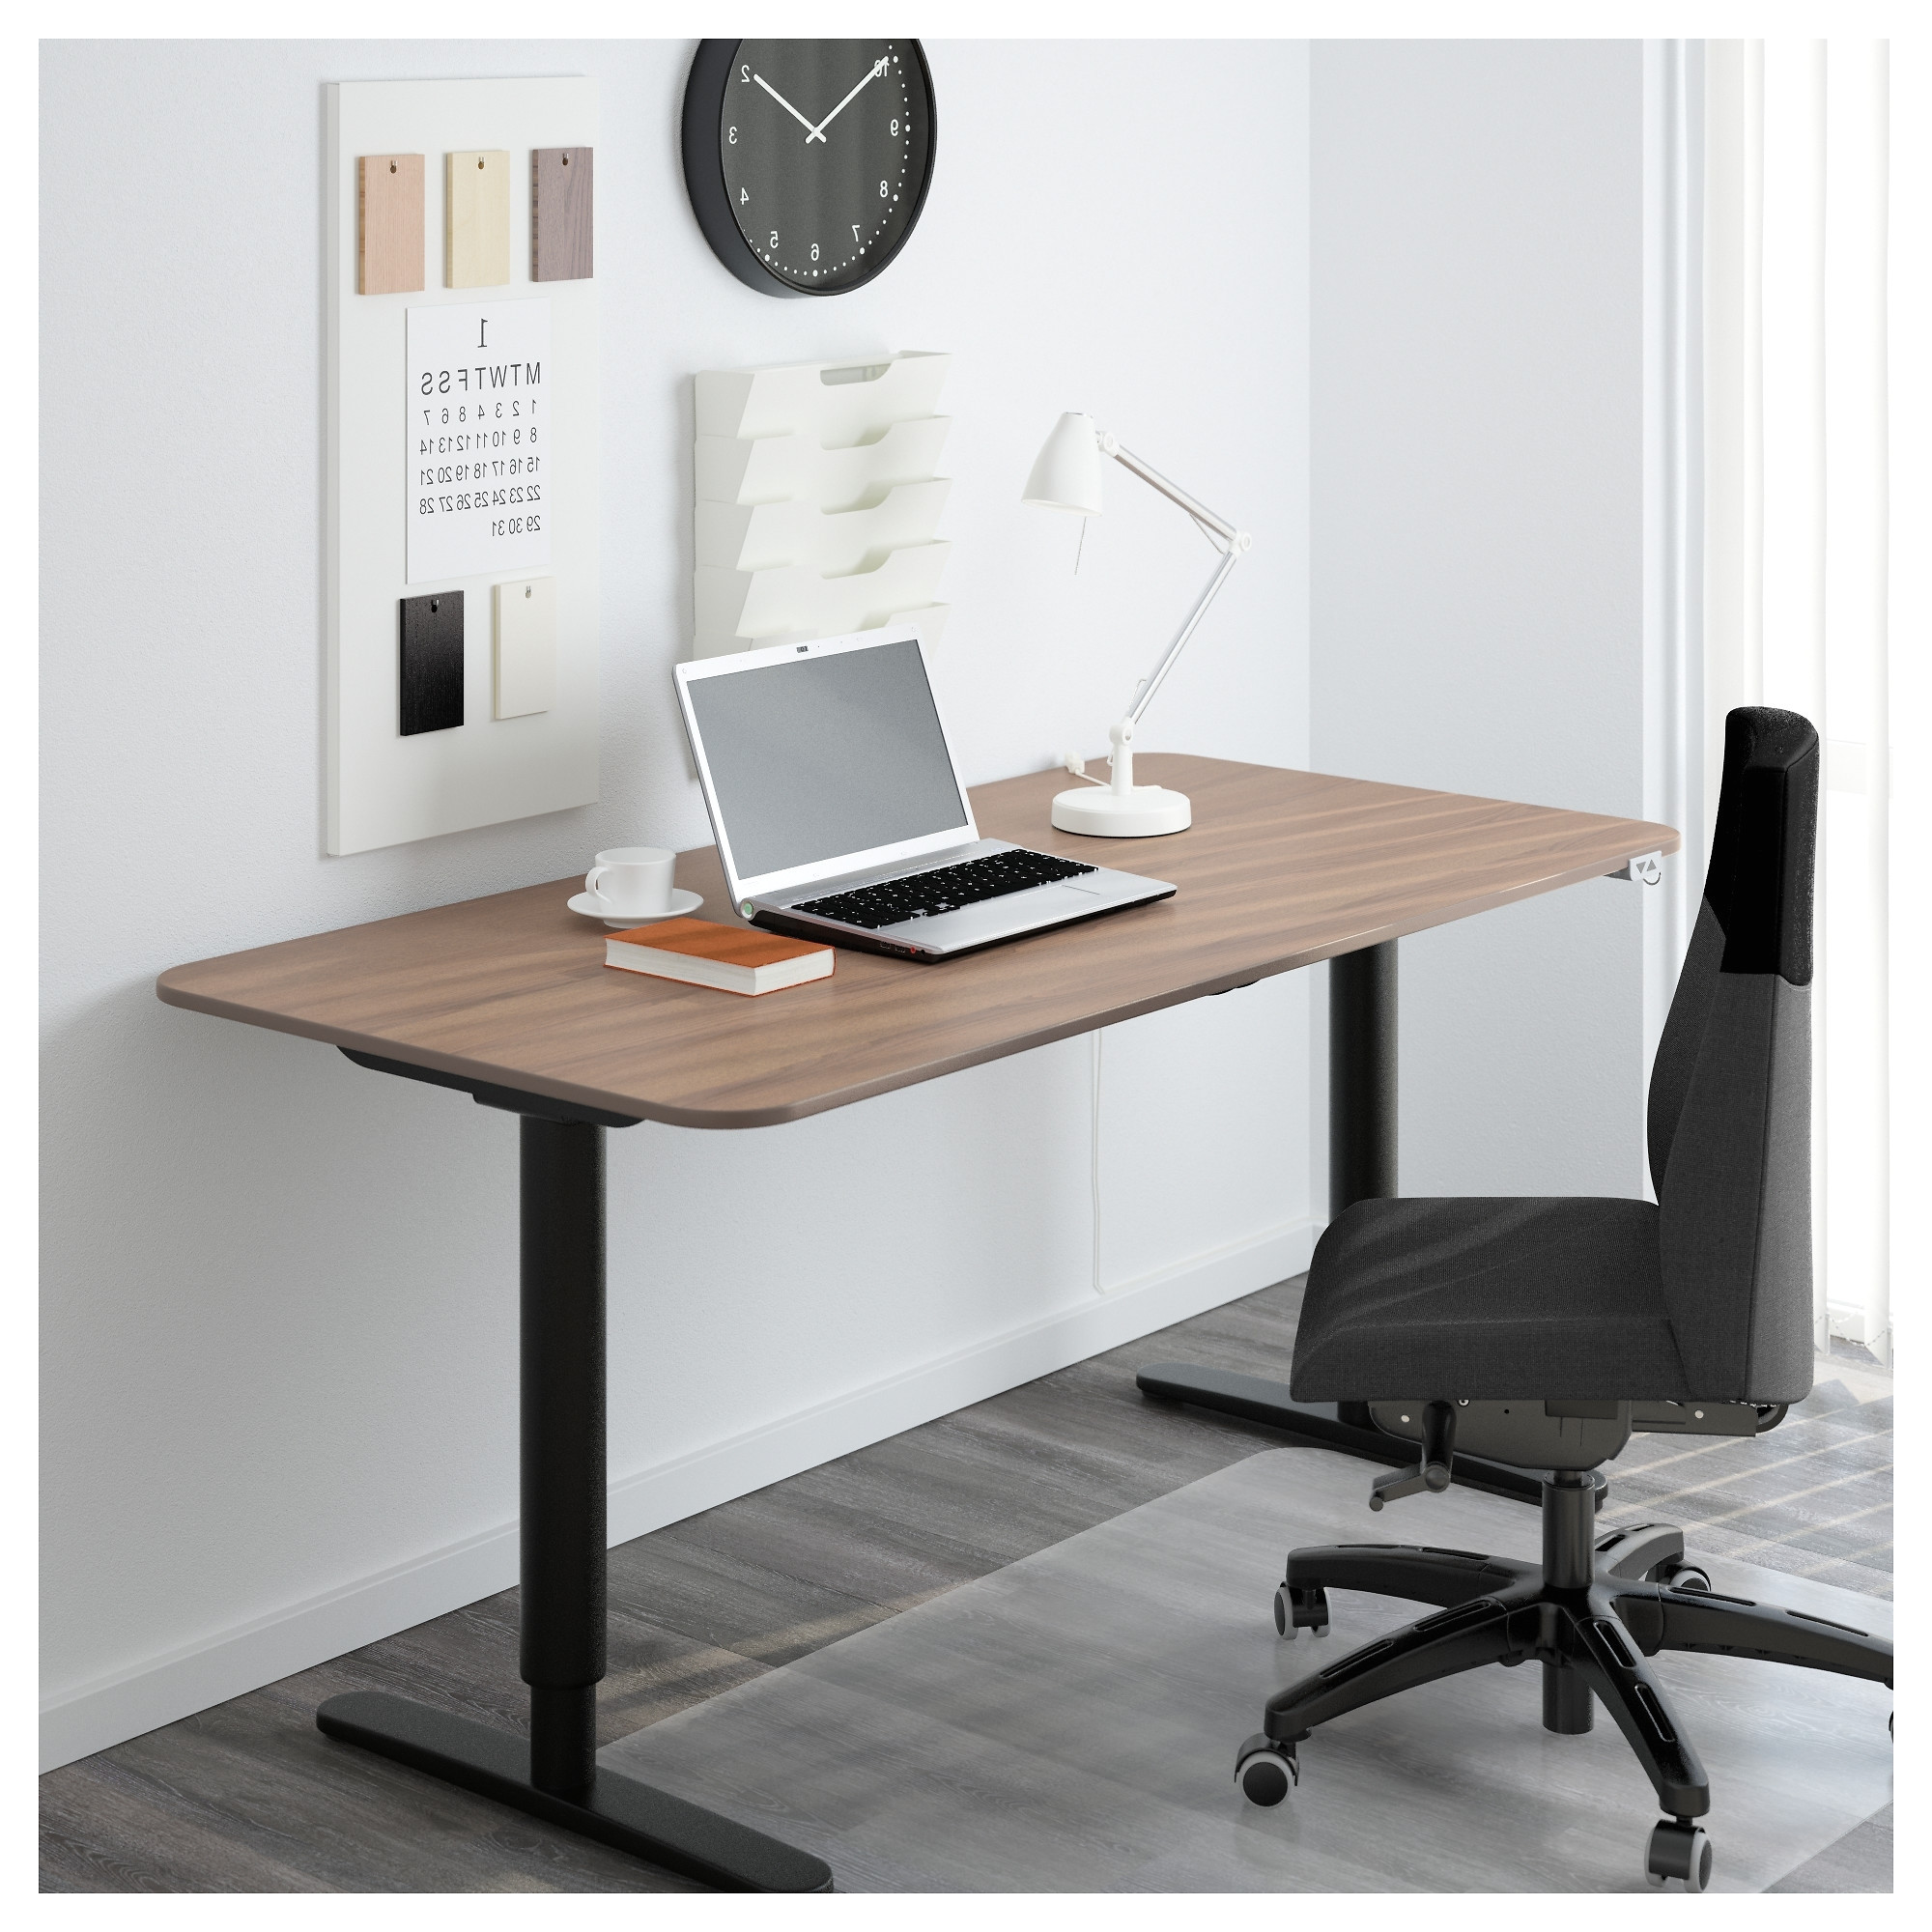 Ikea Galant Left Corner Desk assembly Instructions 20 Collection Of Ikea Galant Computer Desks